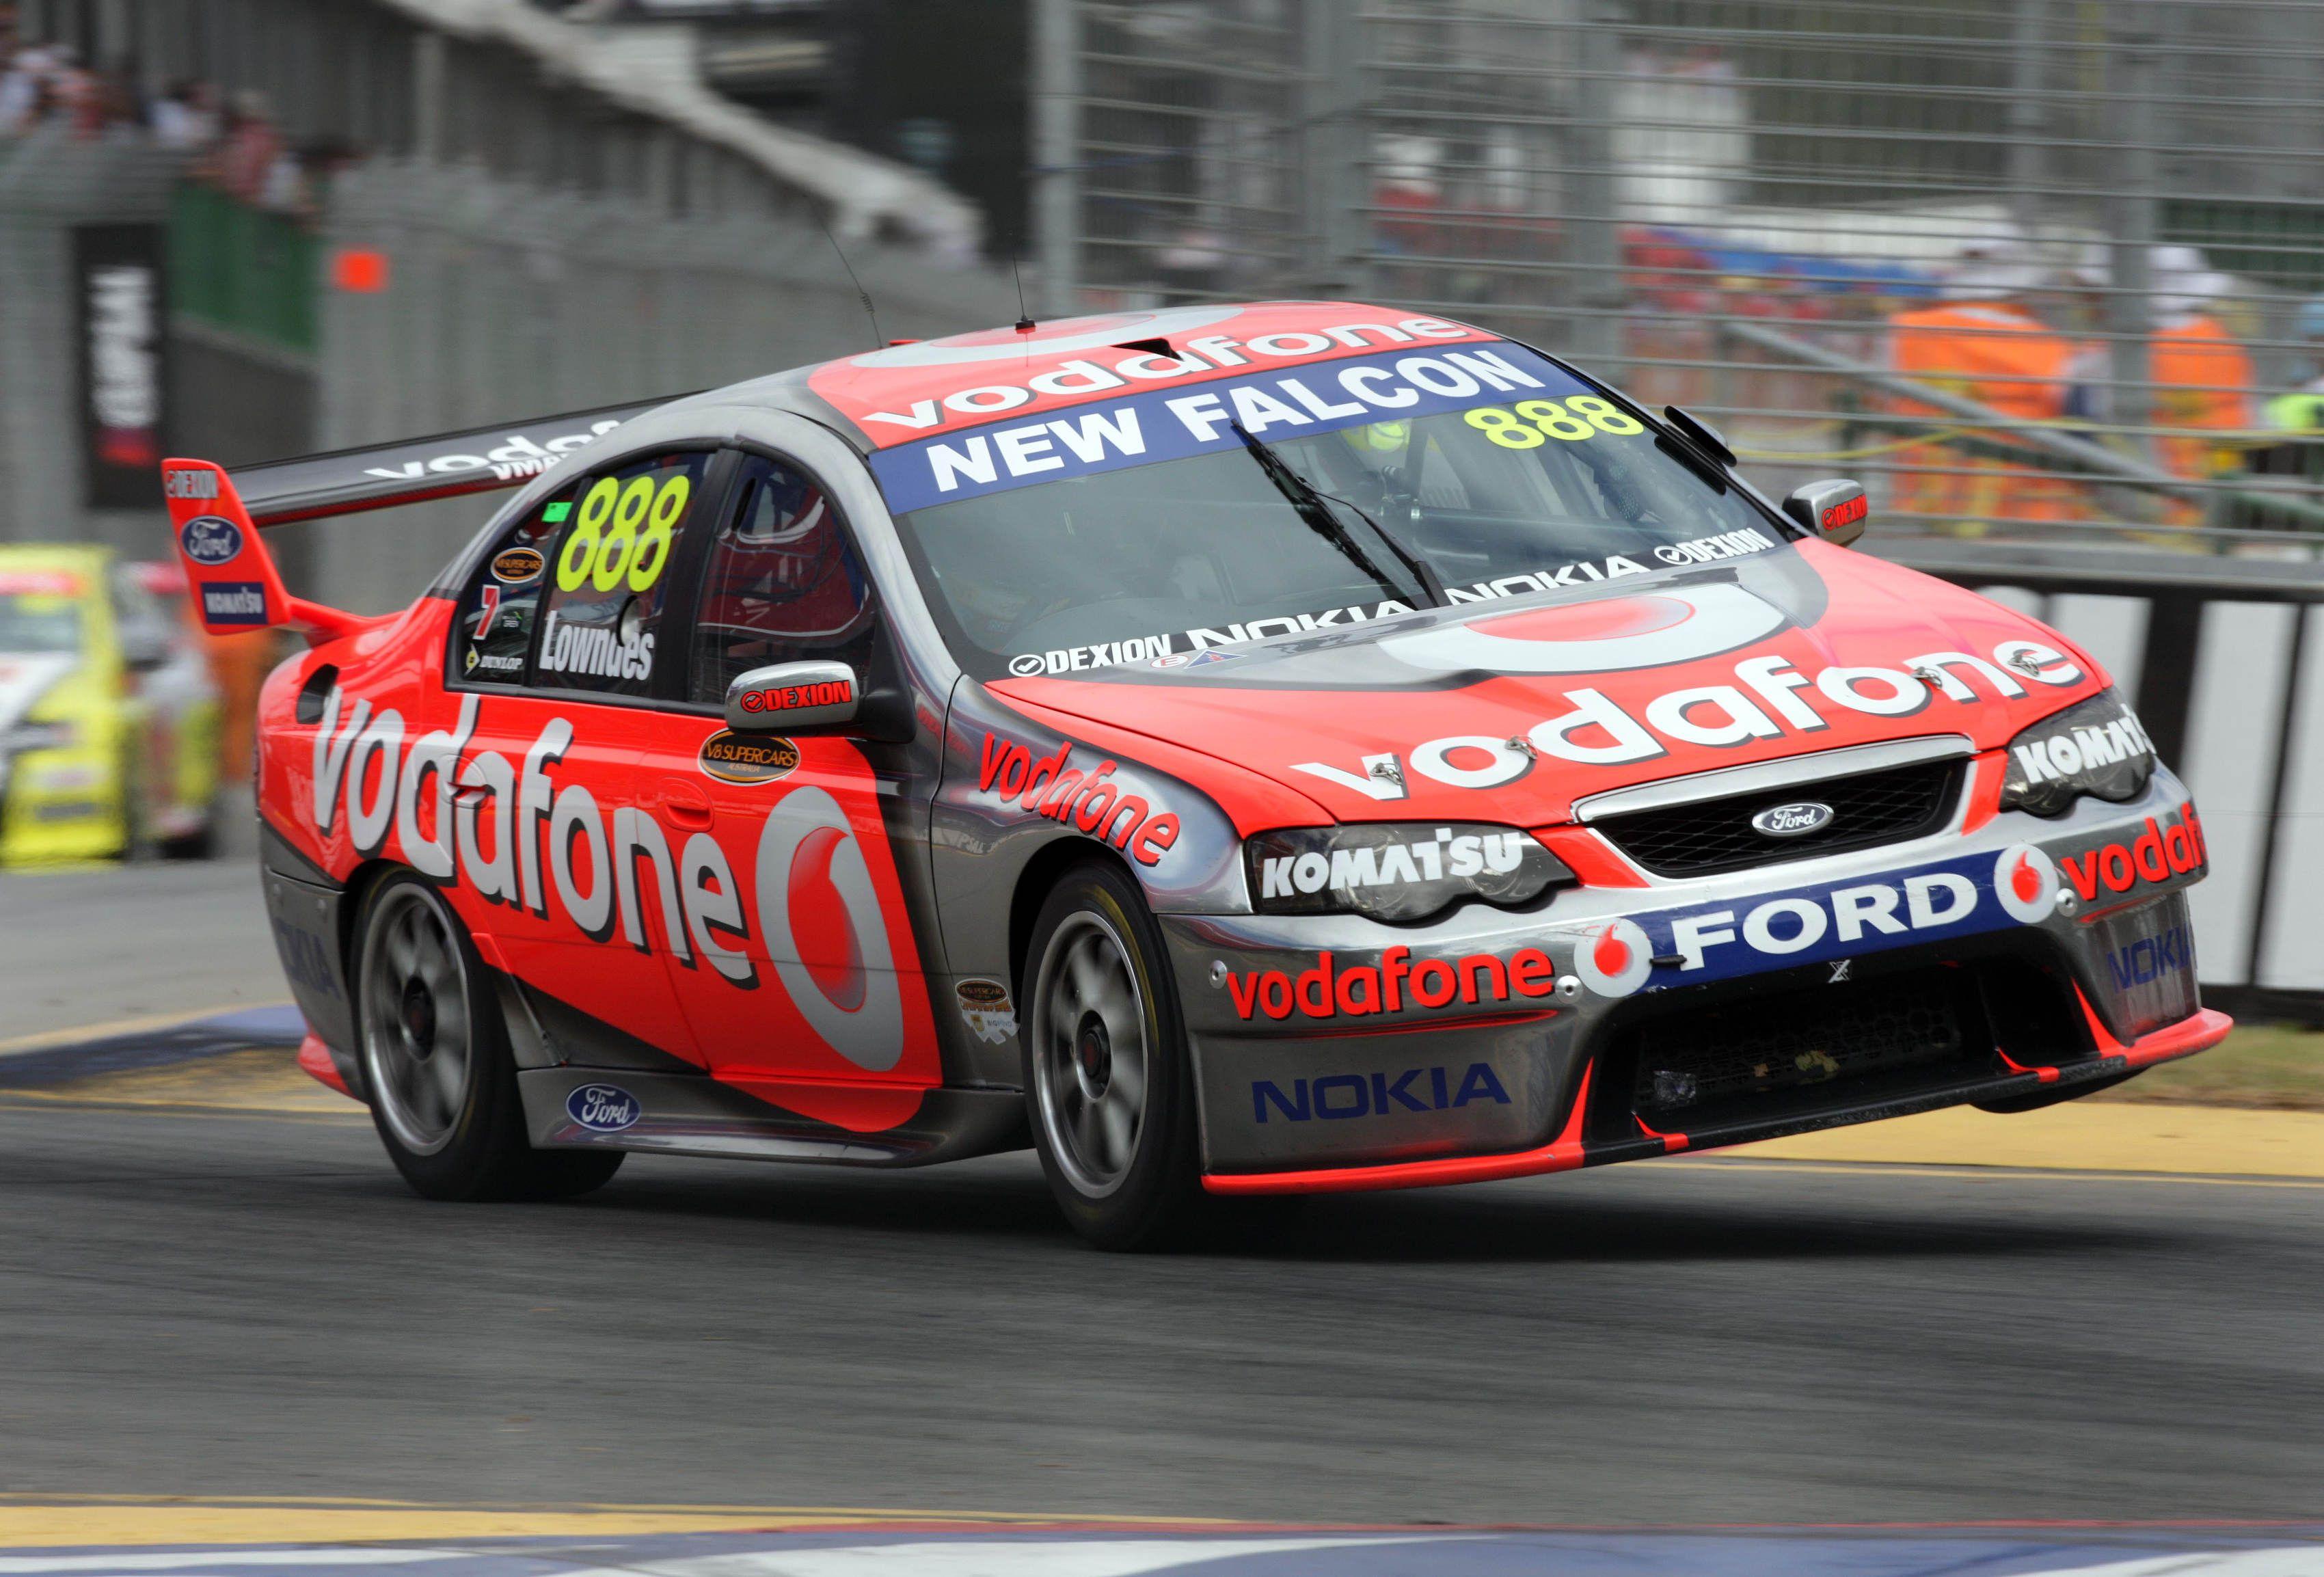 Craig Lowndes 2008 Ba Supercar Ford Falcon Australia Super Cars V8 Supercars Australia